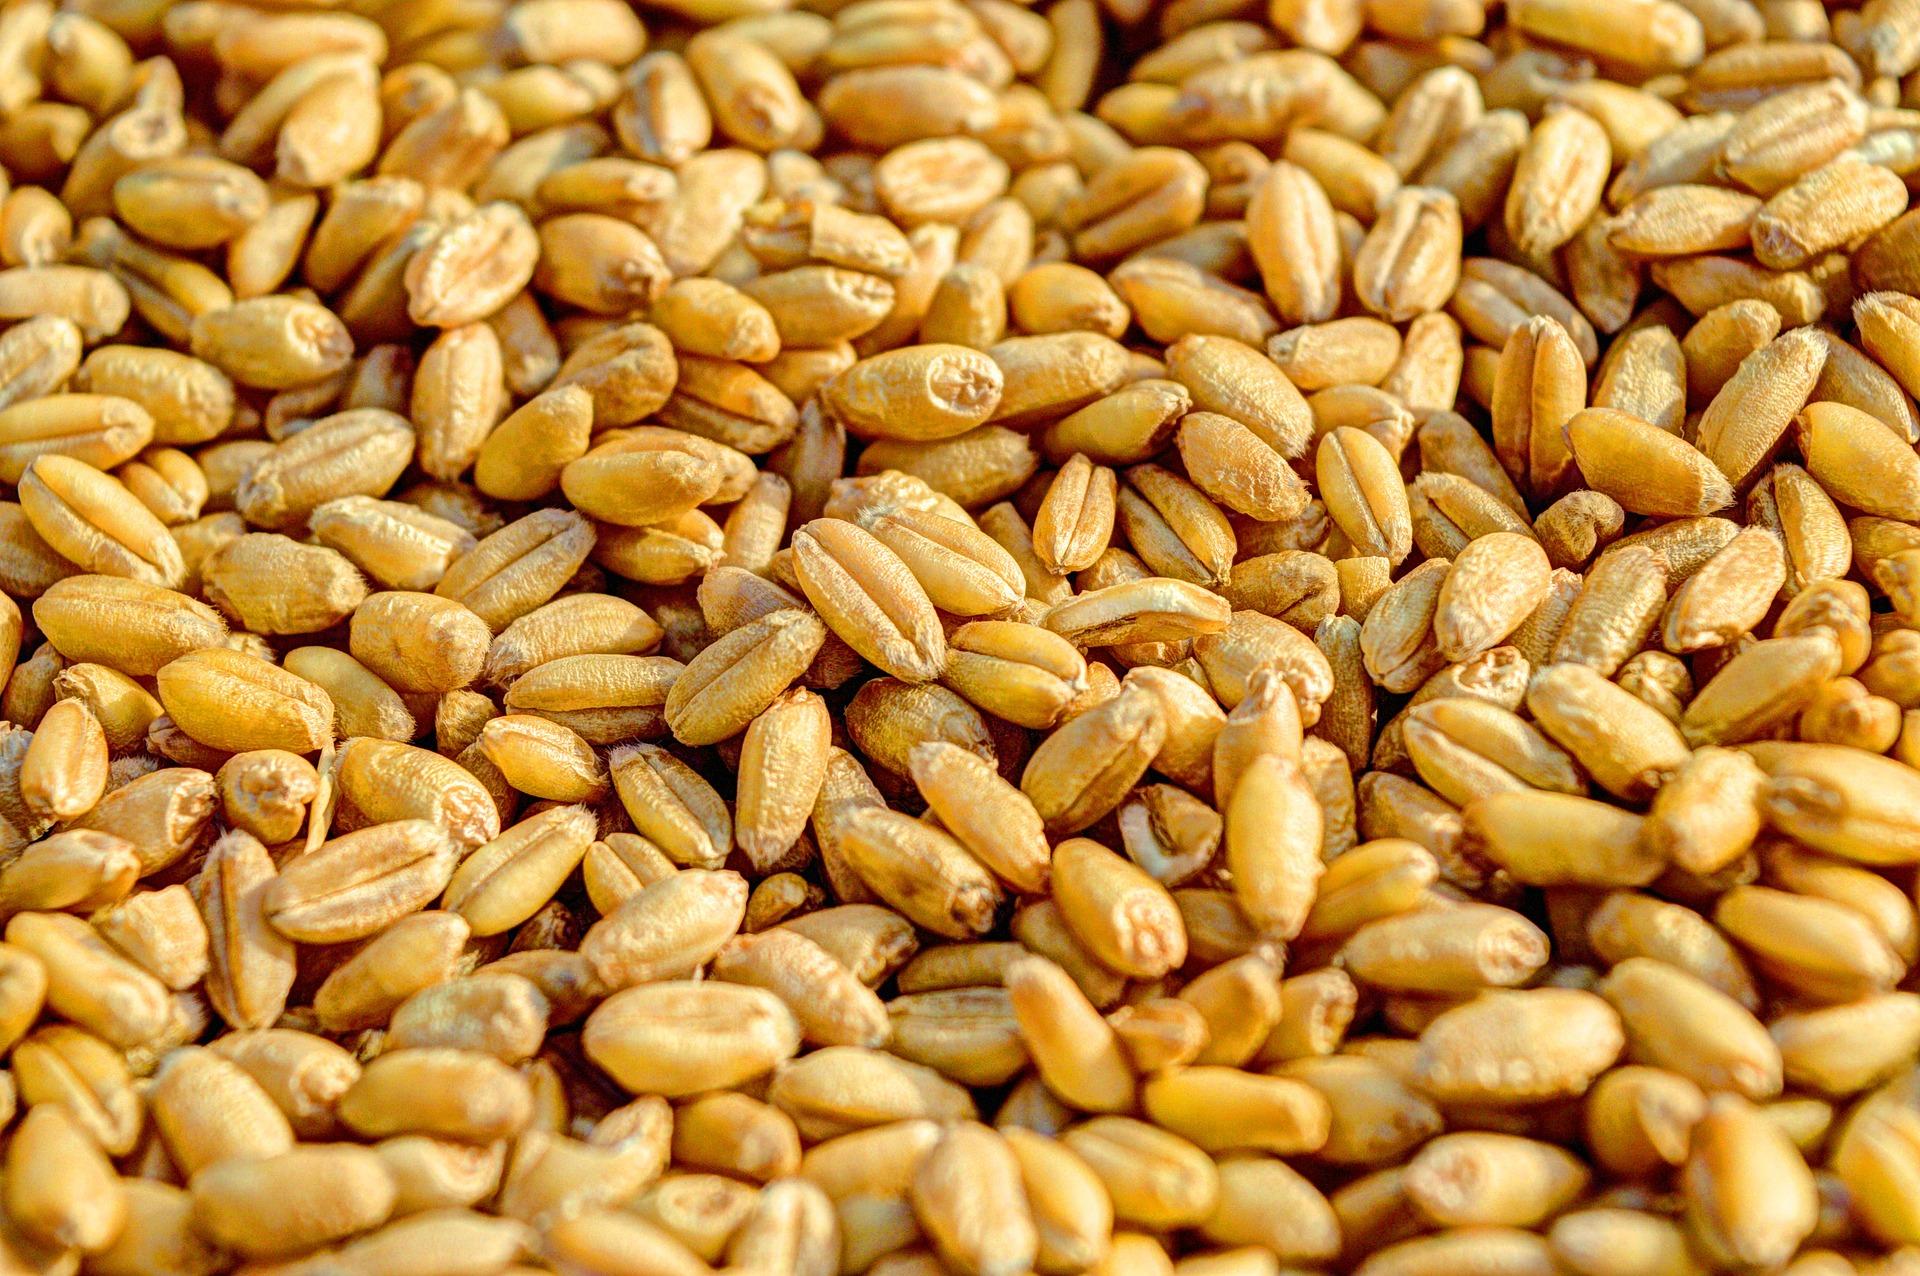 Україна збільшила експорт зерна на 30% з початку сезону 2019/20